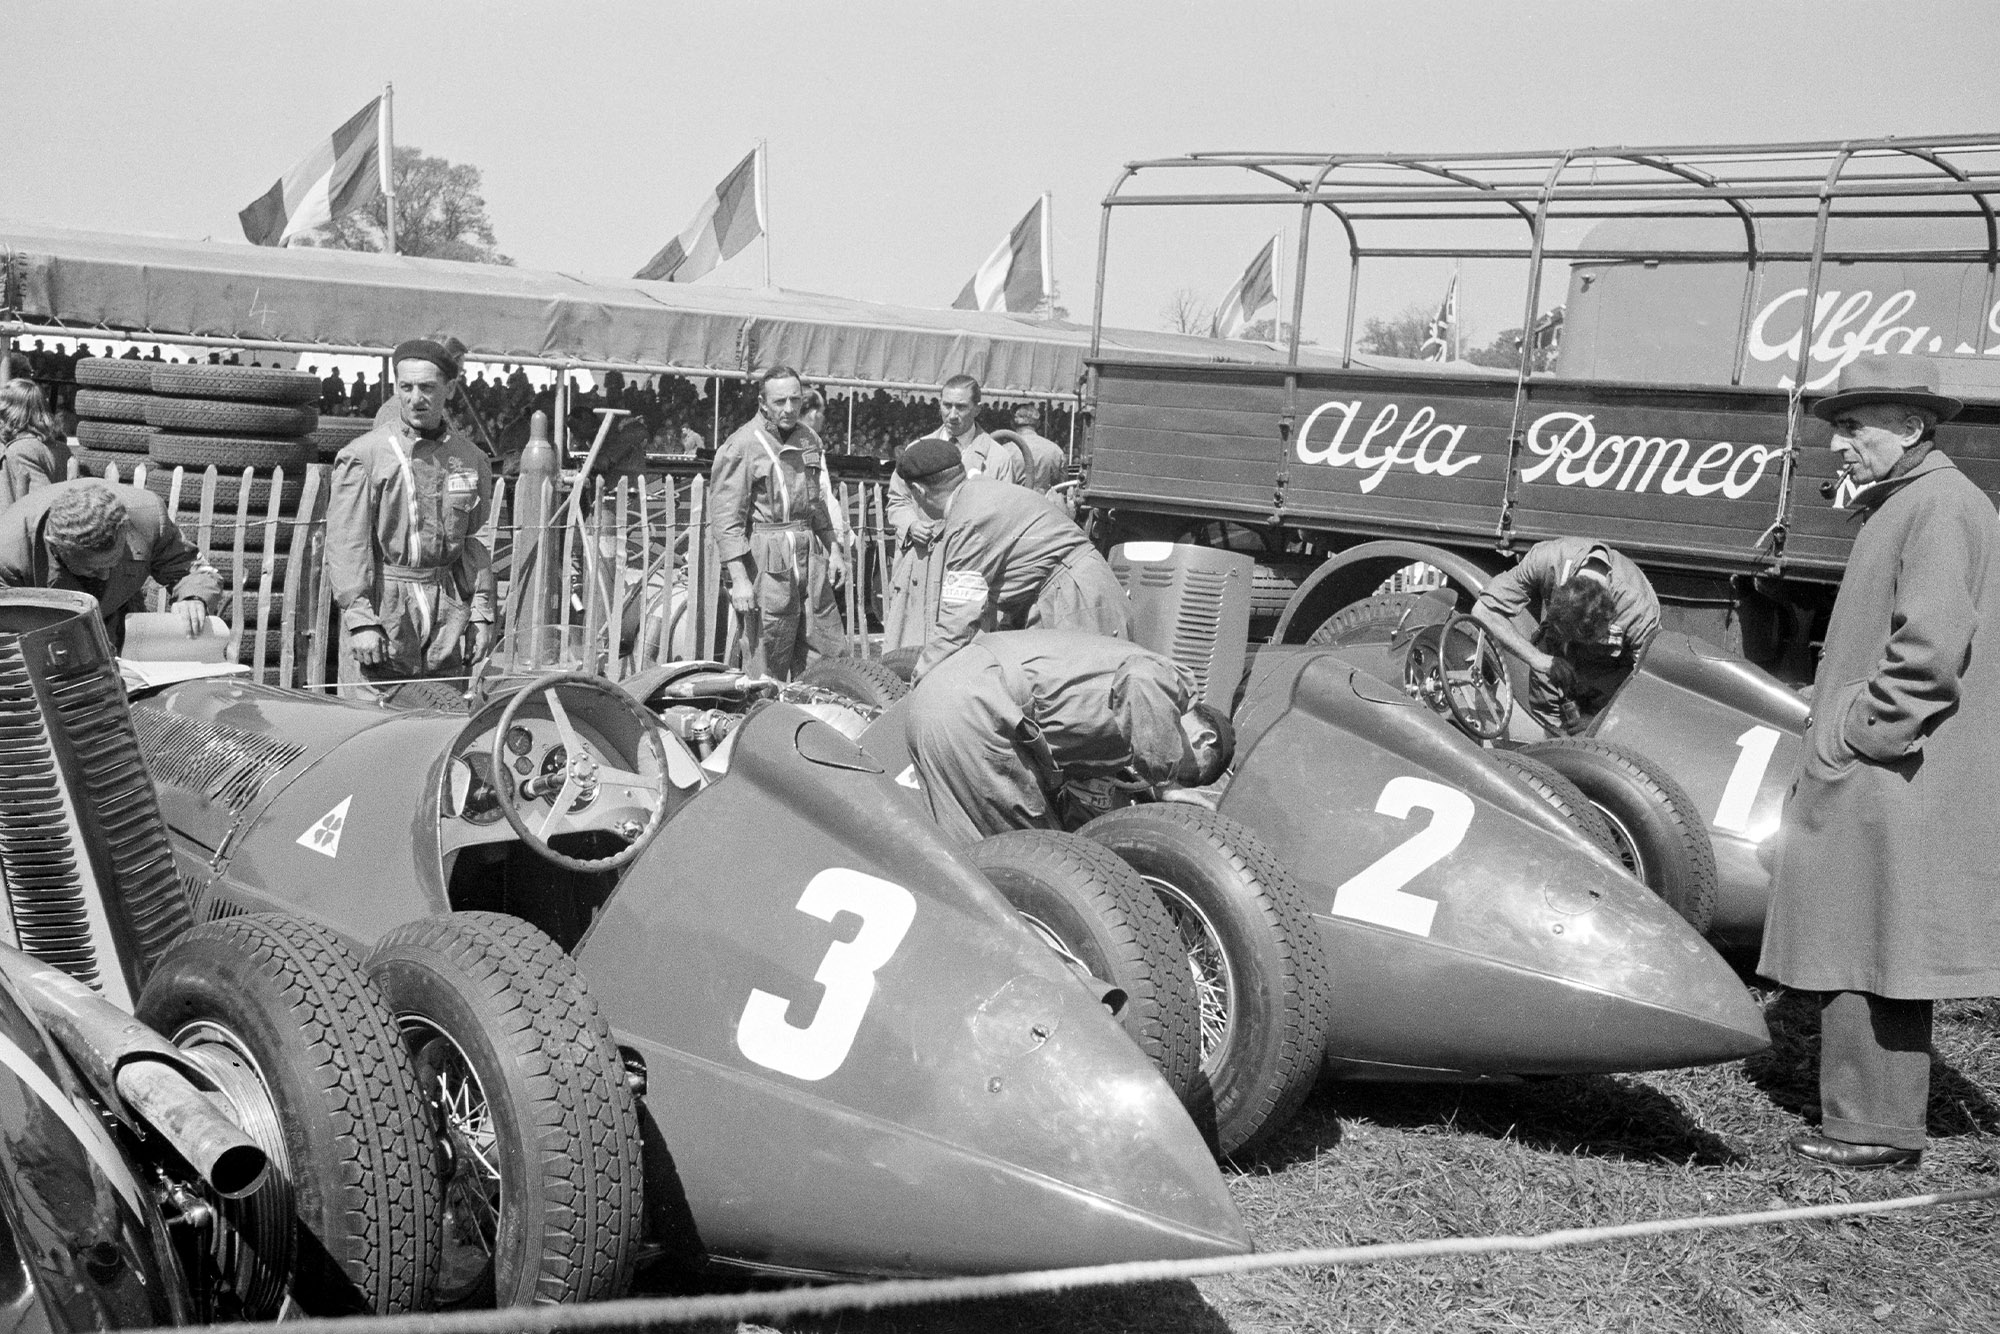 Alfa Romeo cars in the paddock ahead of the 1950 British Grand Prix